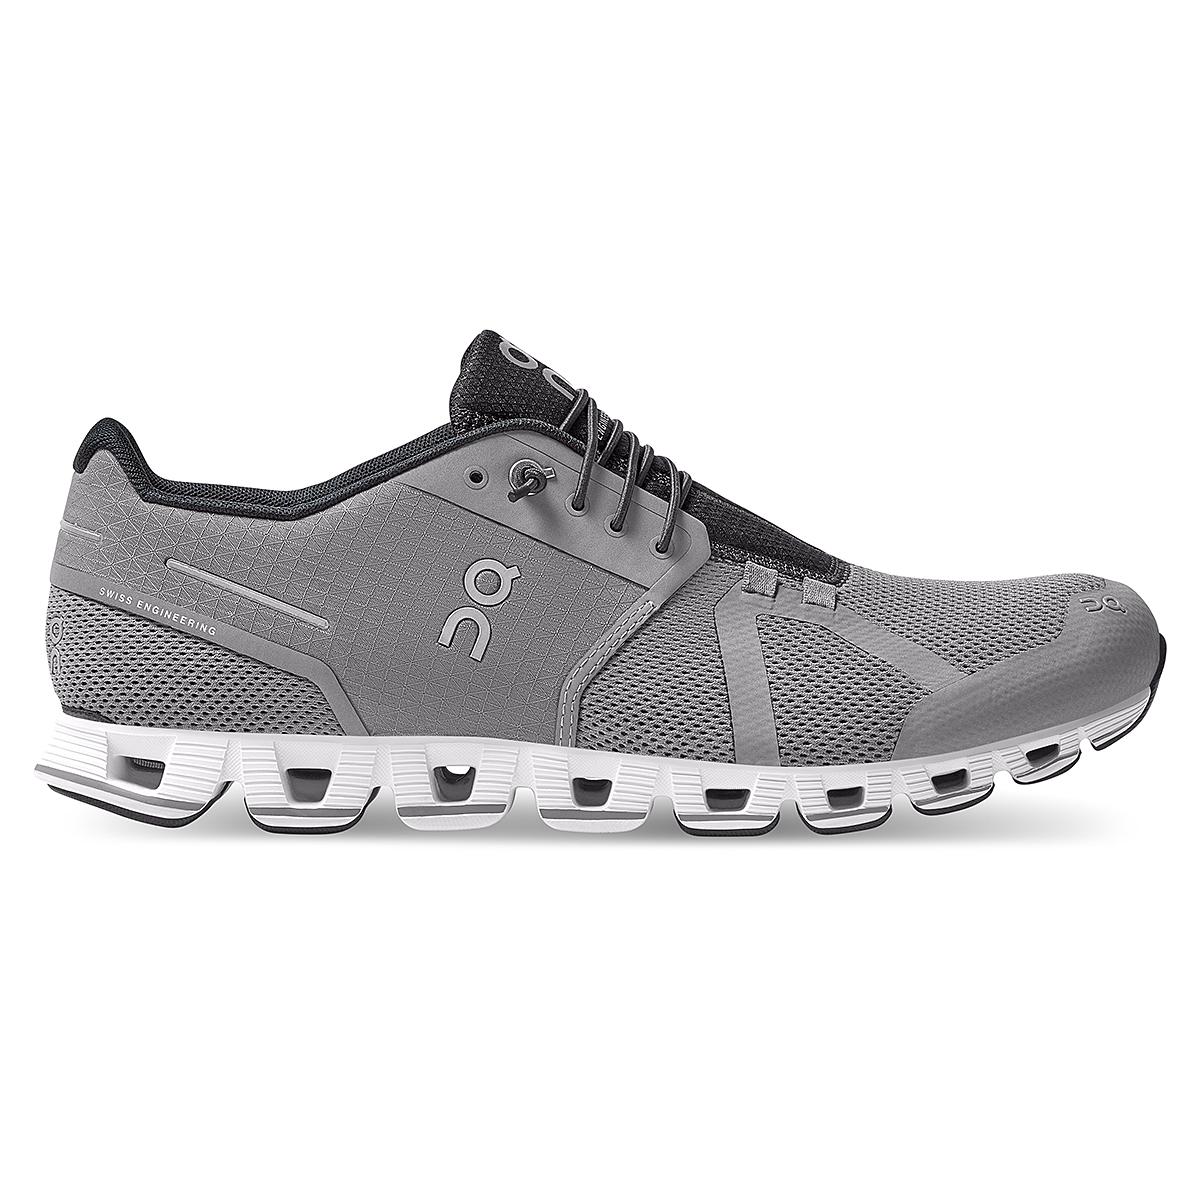 Men's On Cloud Running Shoe - Color: Zinc/White - Size: 7 - Width: Regular, Zinc/White, large, image 1